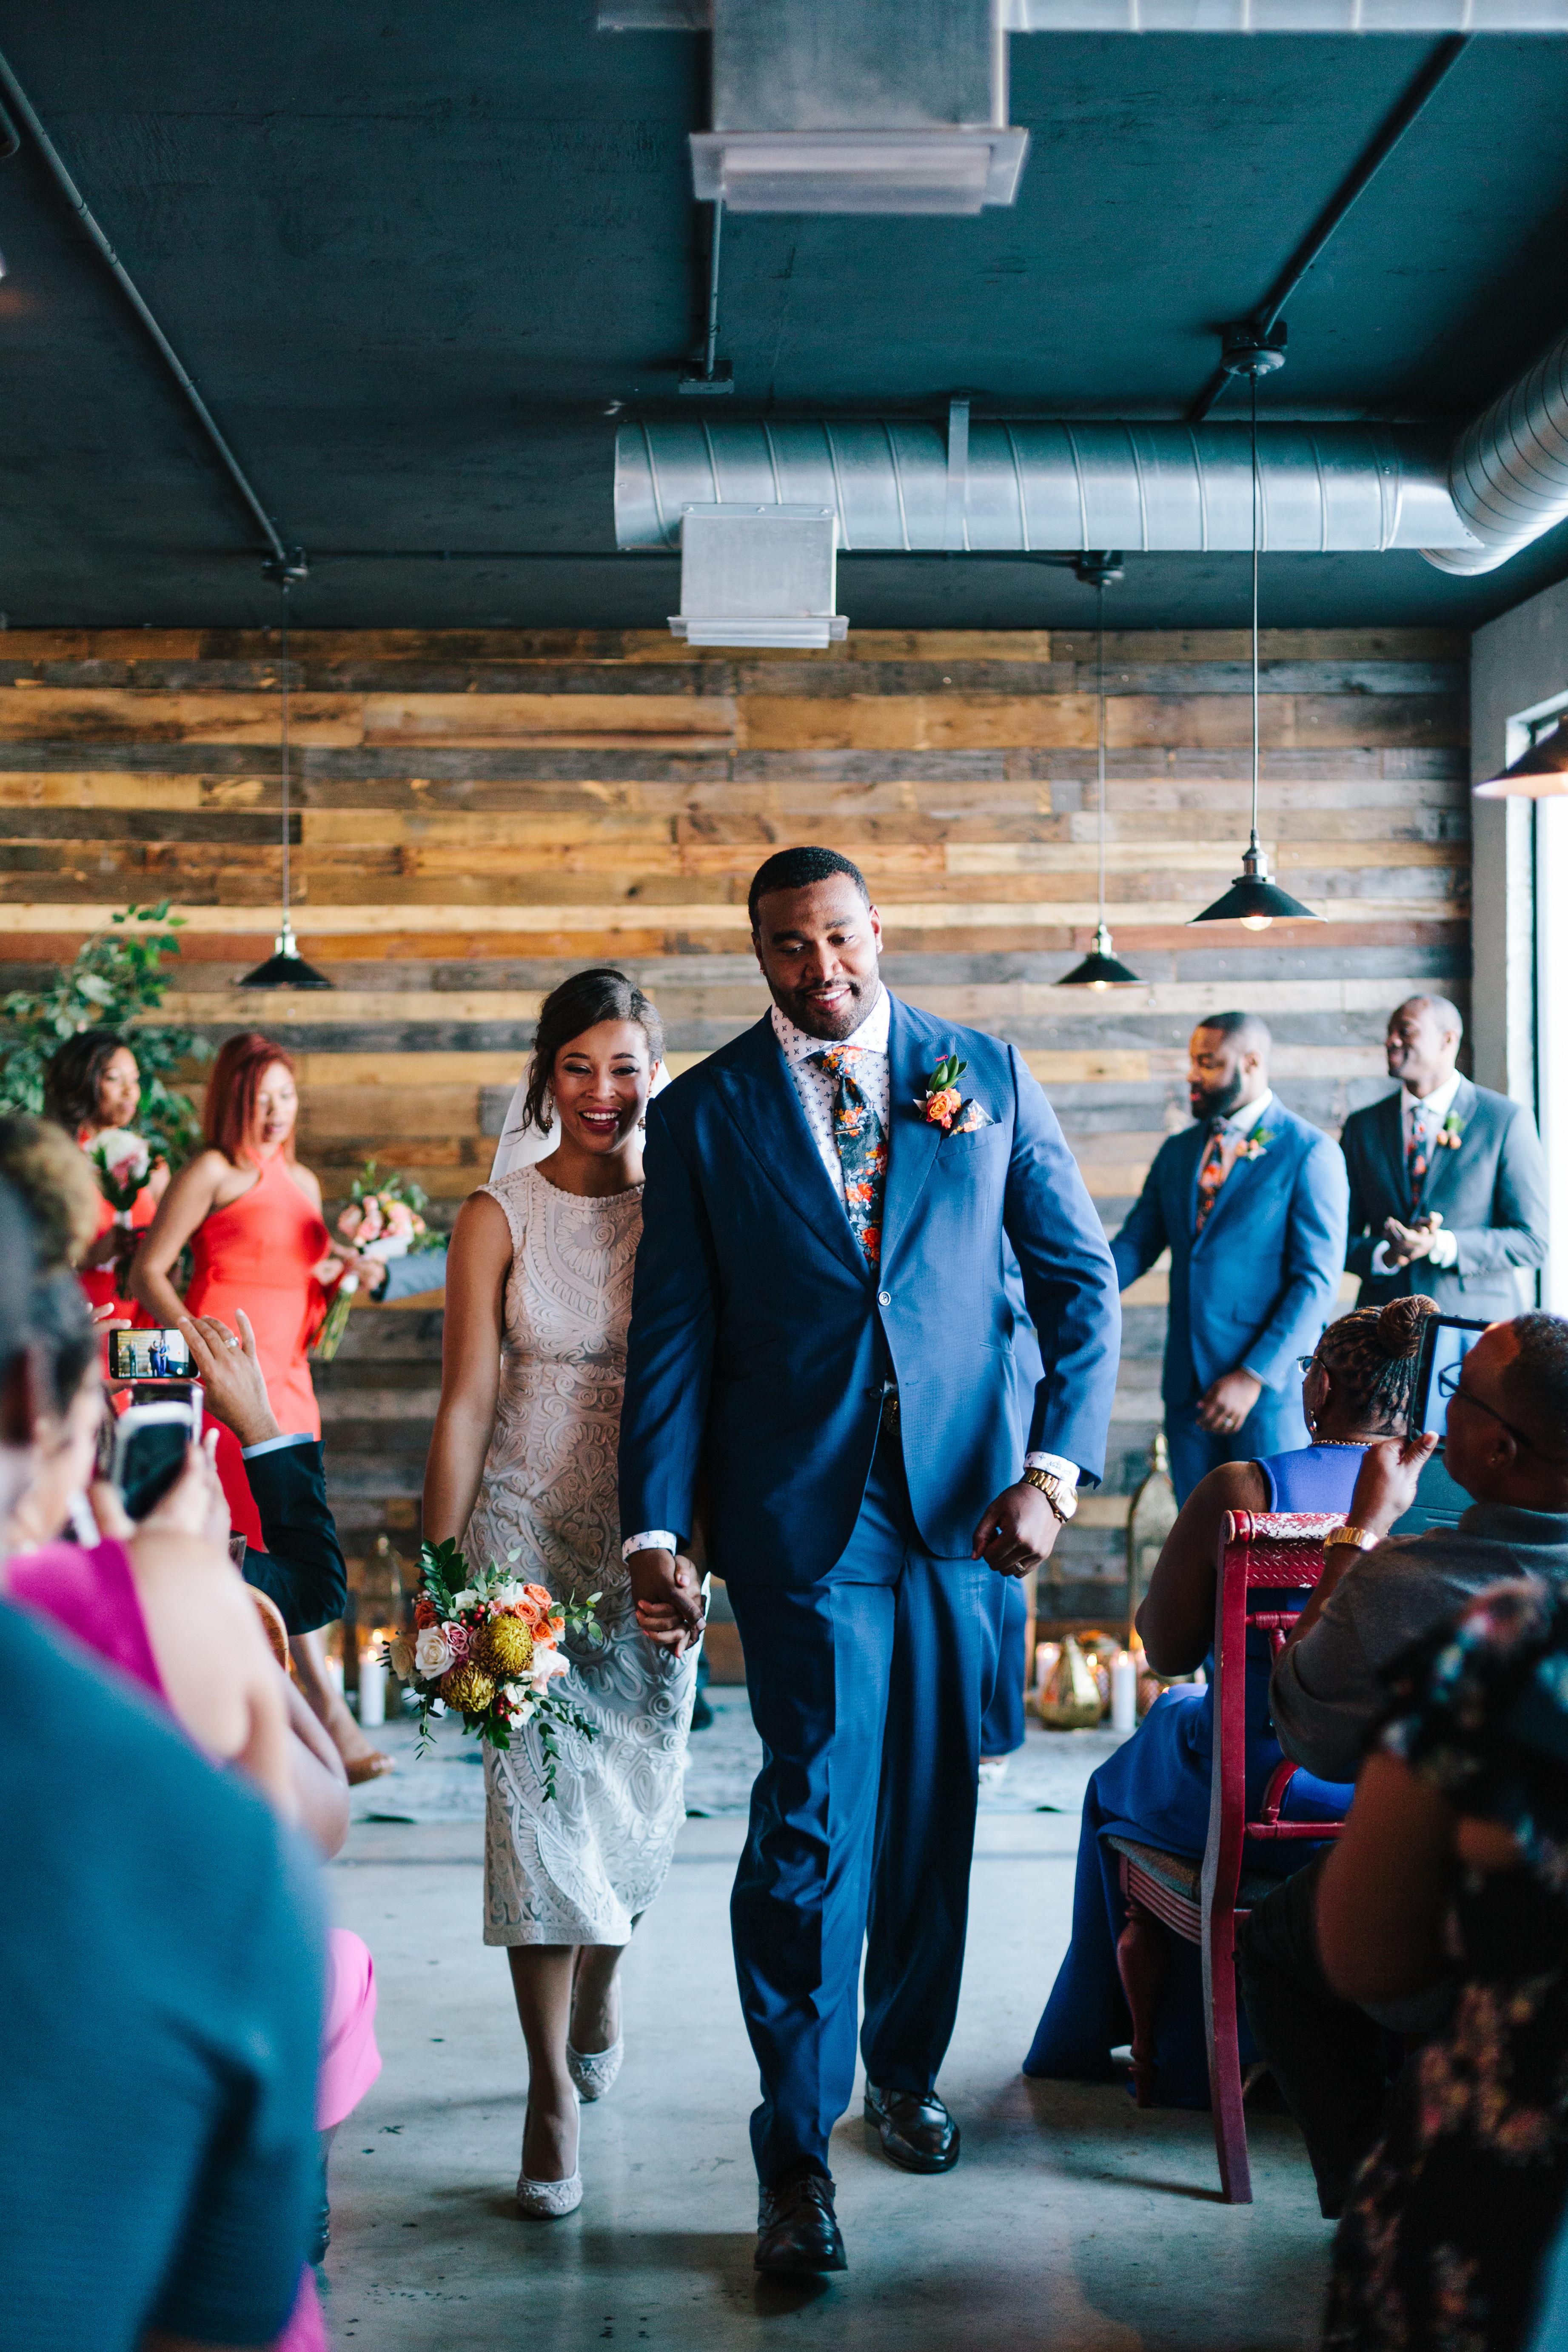 Wedding Phtography